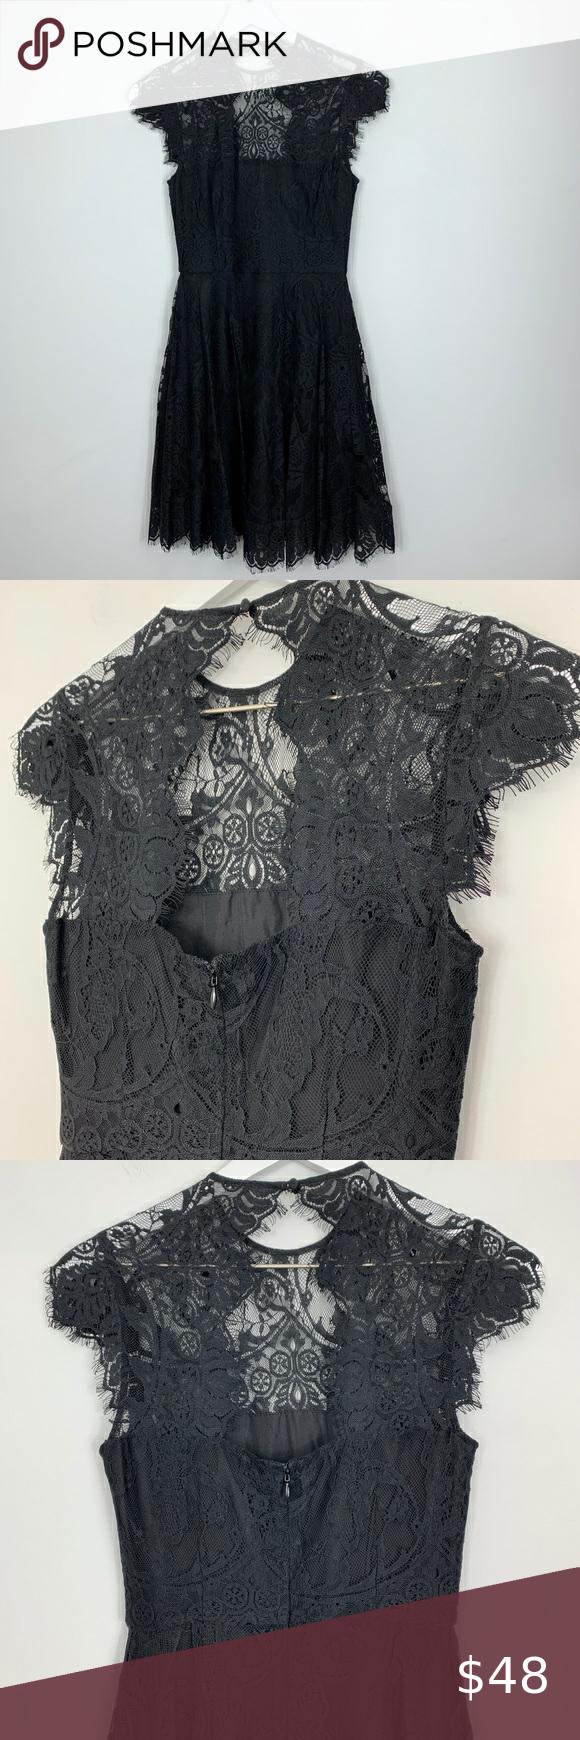 "BB Dakota Black Lace Fit & Flare Dress Sz 0 NWT Approximate measurements  Pit to pit 16"" Waist 12.5"" Hip 24"" Length 36""  A00 0502 BB Dakota Dresses"